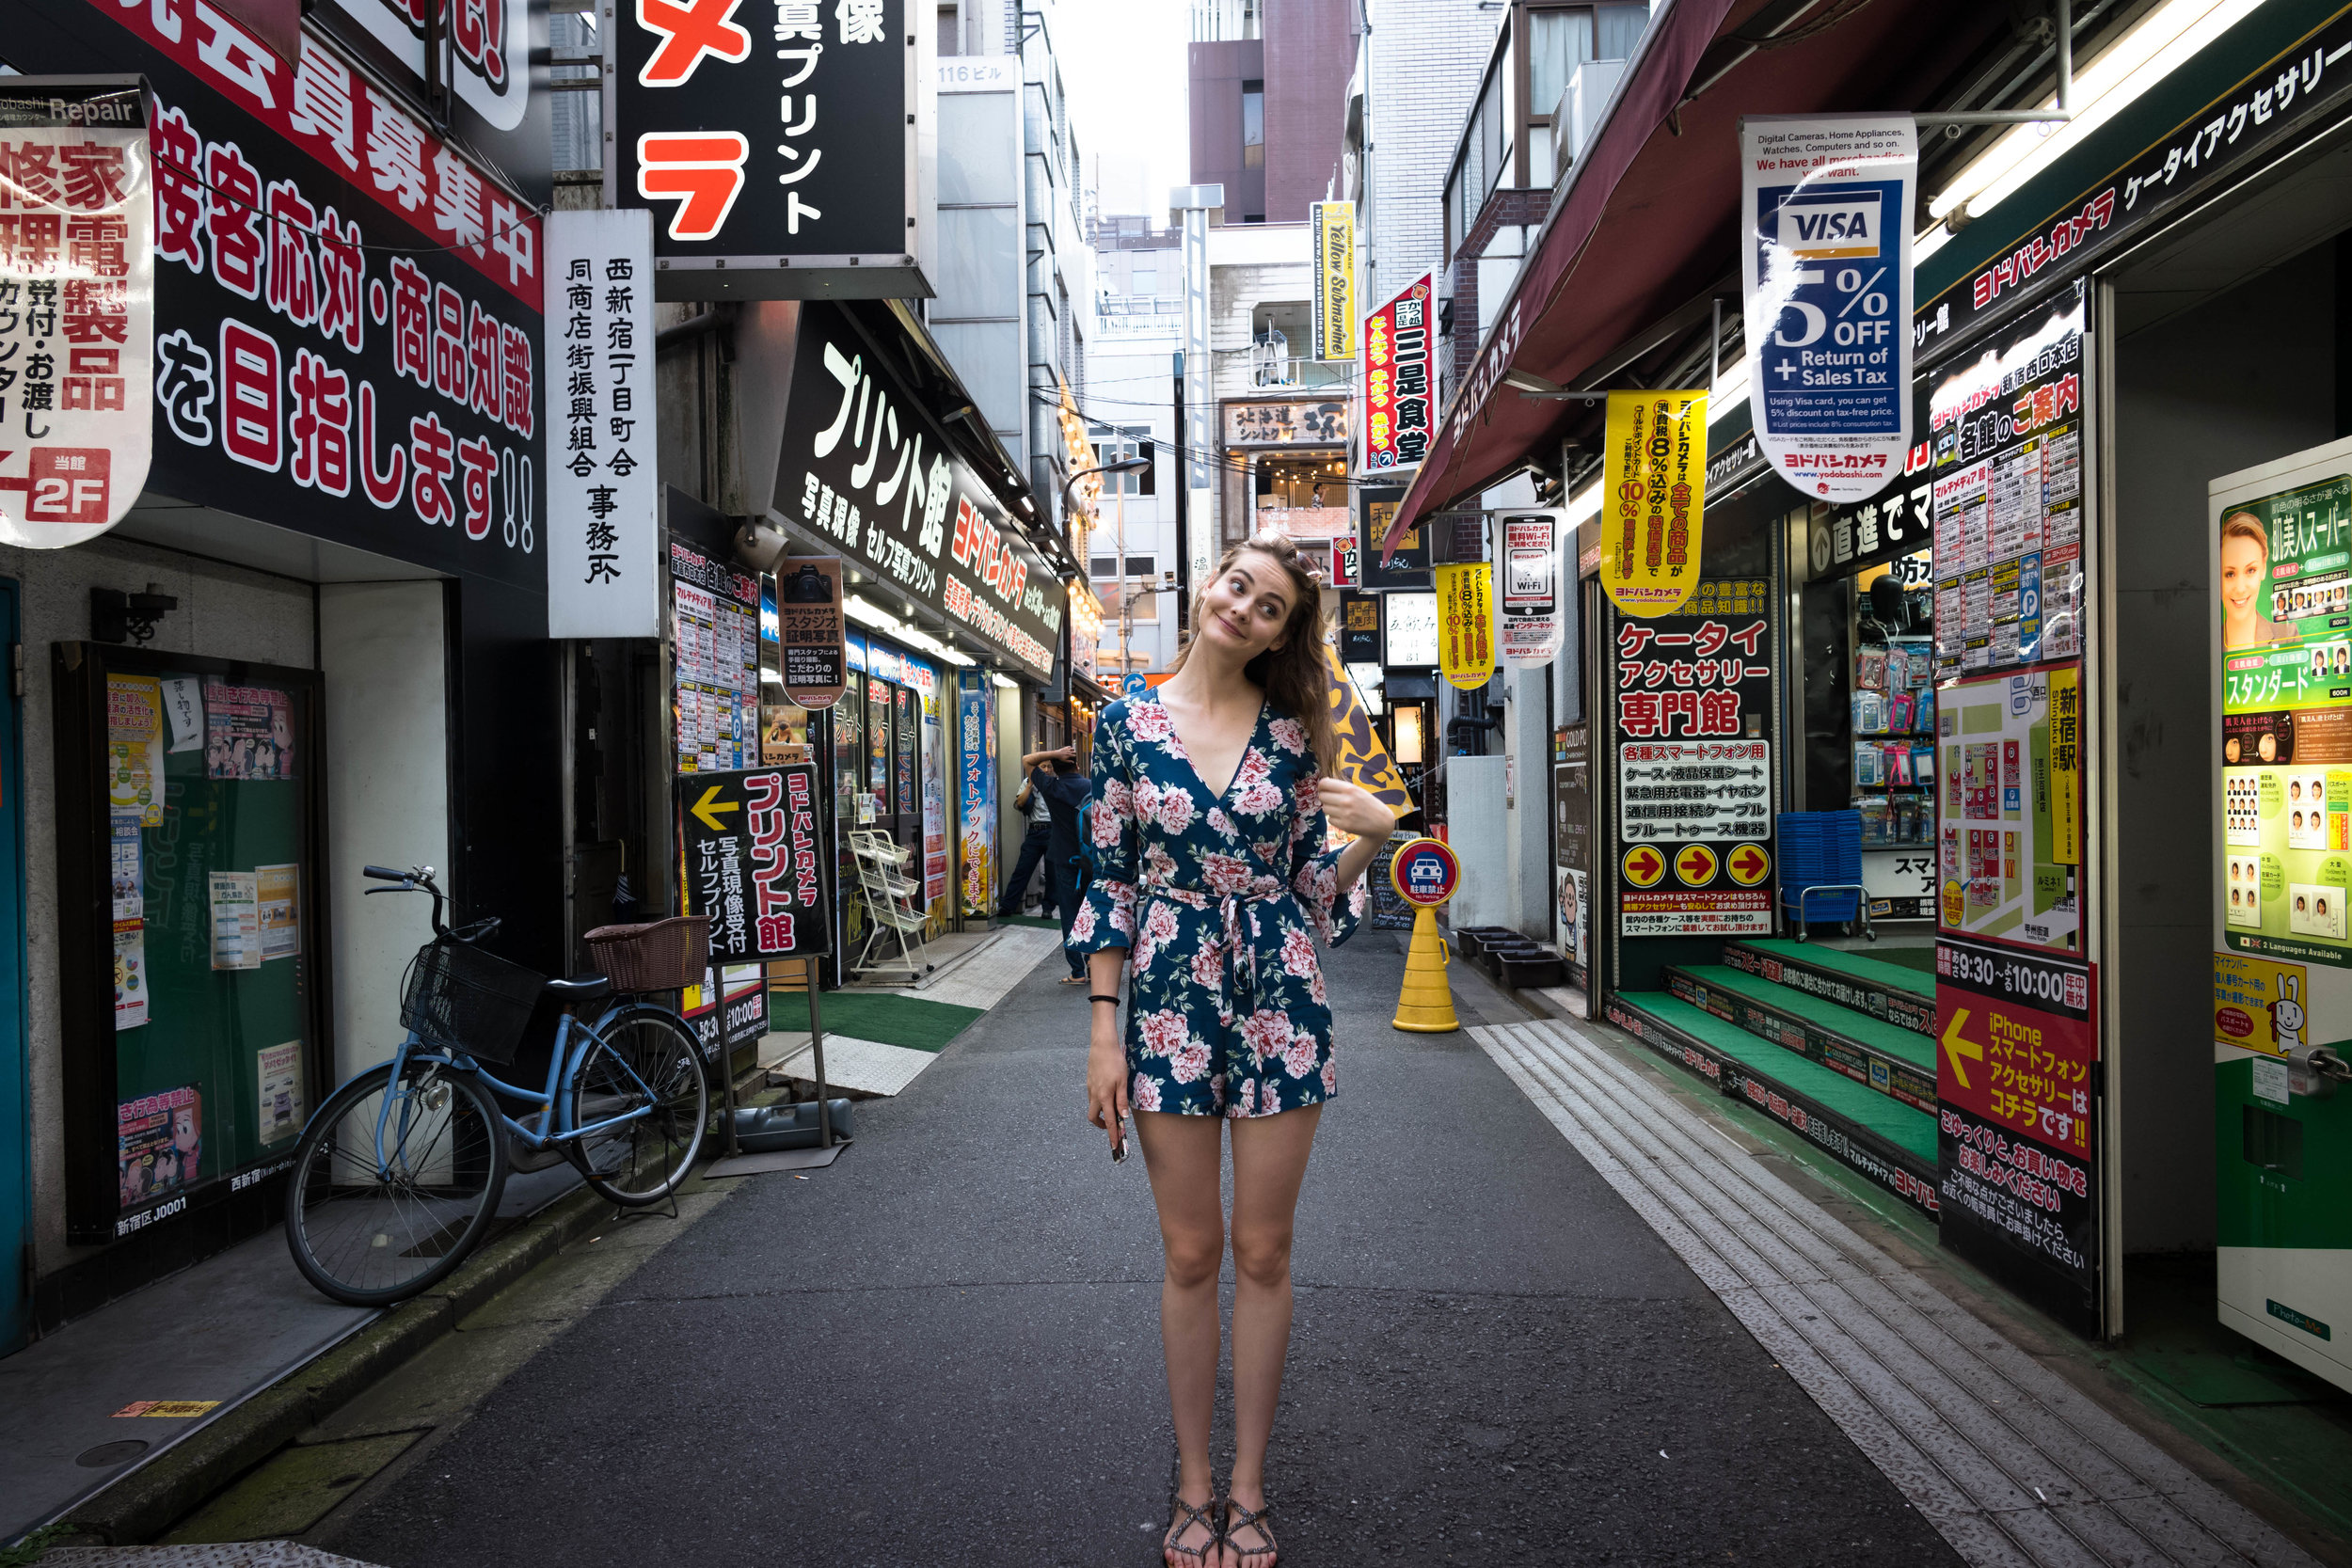 Looking for film in Shinjuku